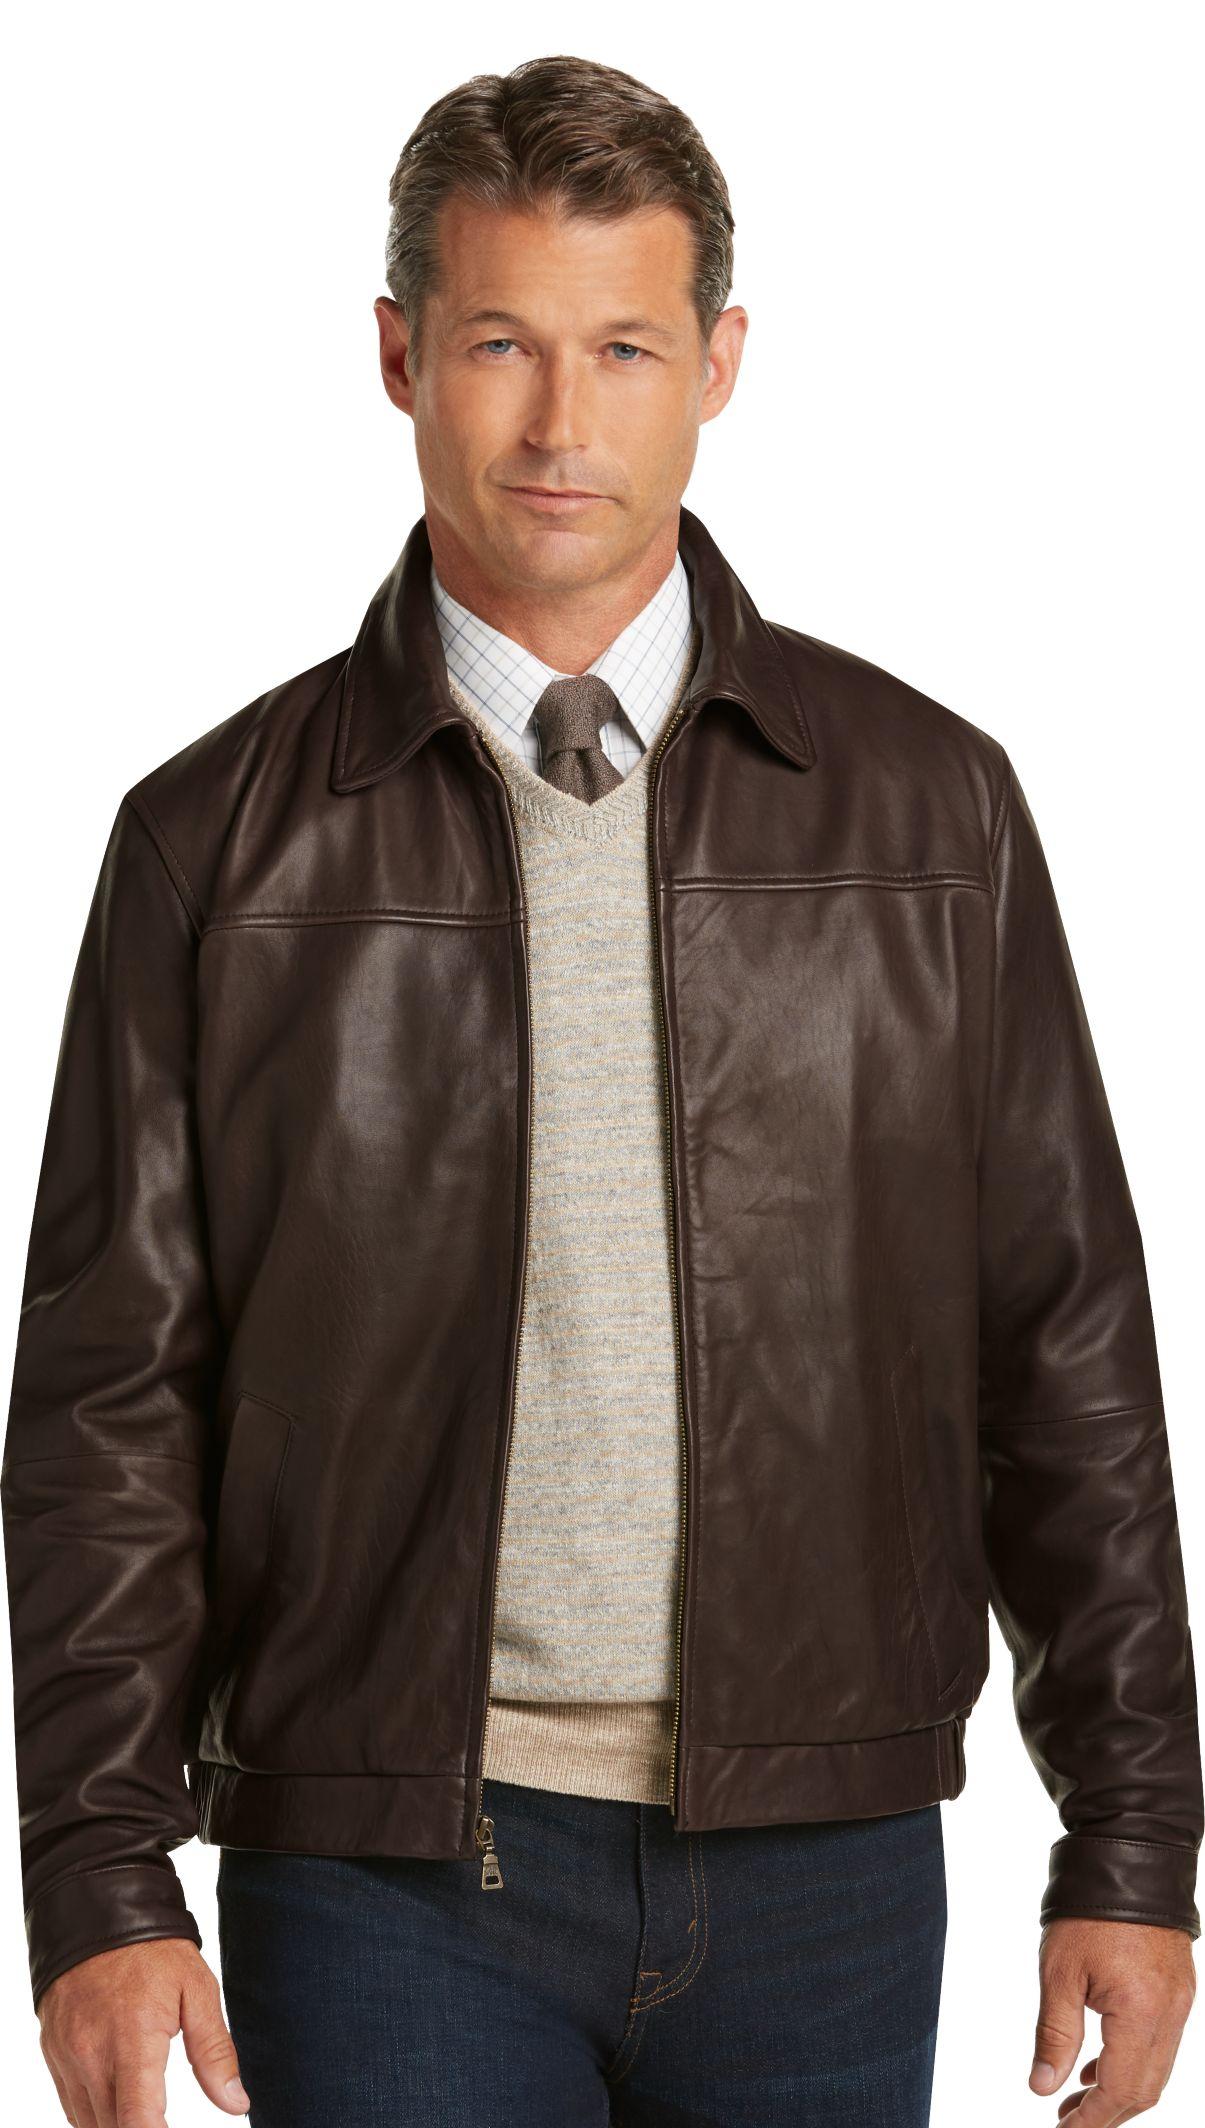 All Outerwear | Men's Outerwear | JoS. A. Bank Clothiers